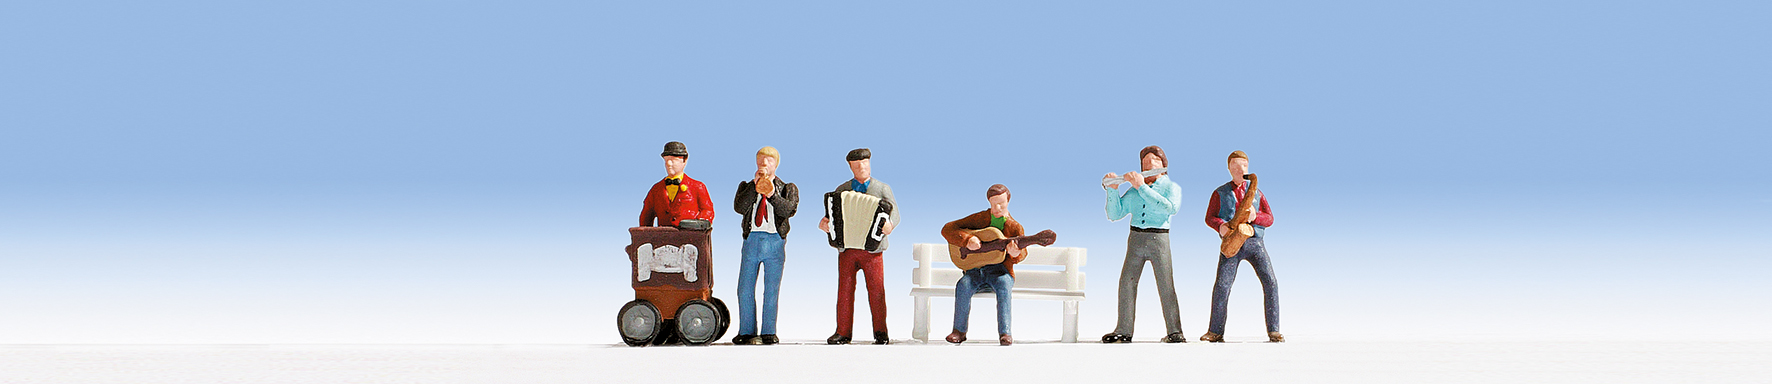 Straßenmusiker (Sound-Szene)